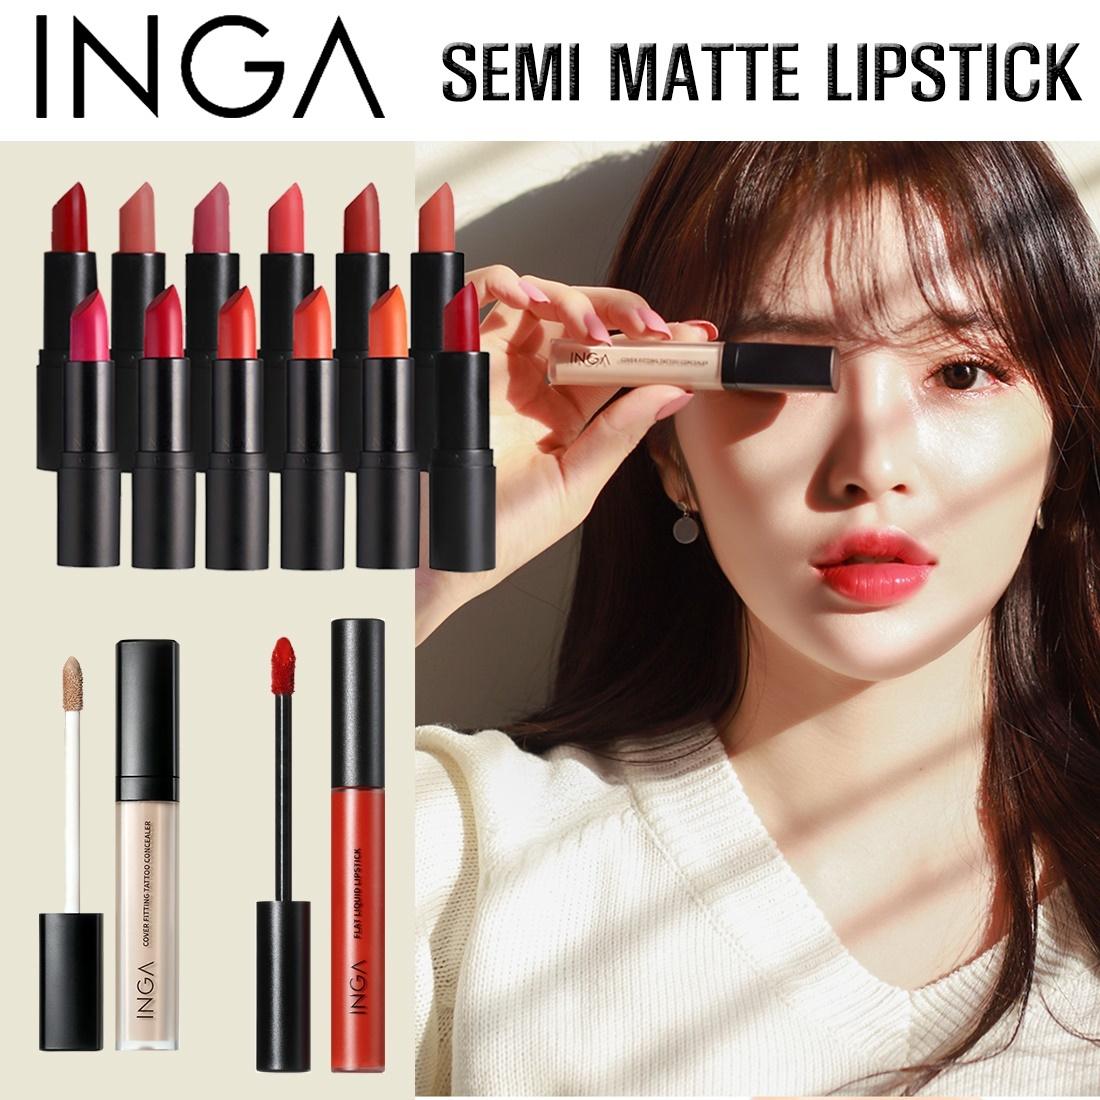 Qoo10 Inga Matte Lipstick Cosmetics